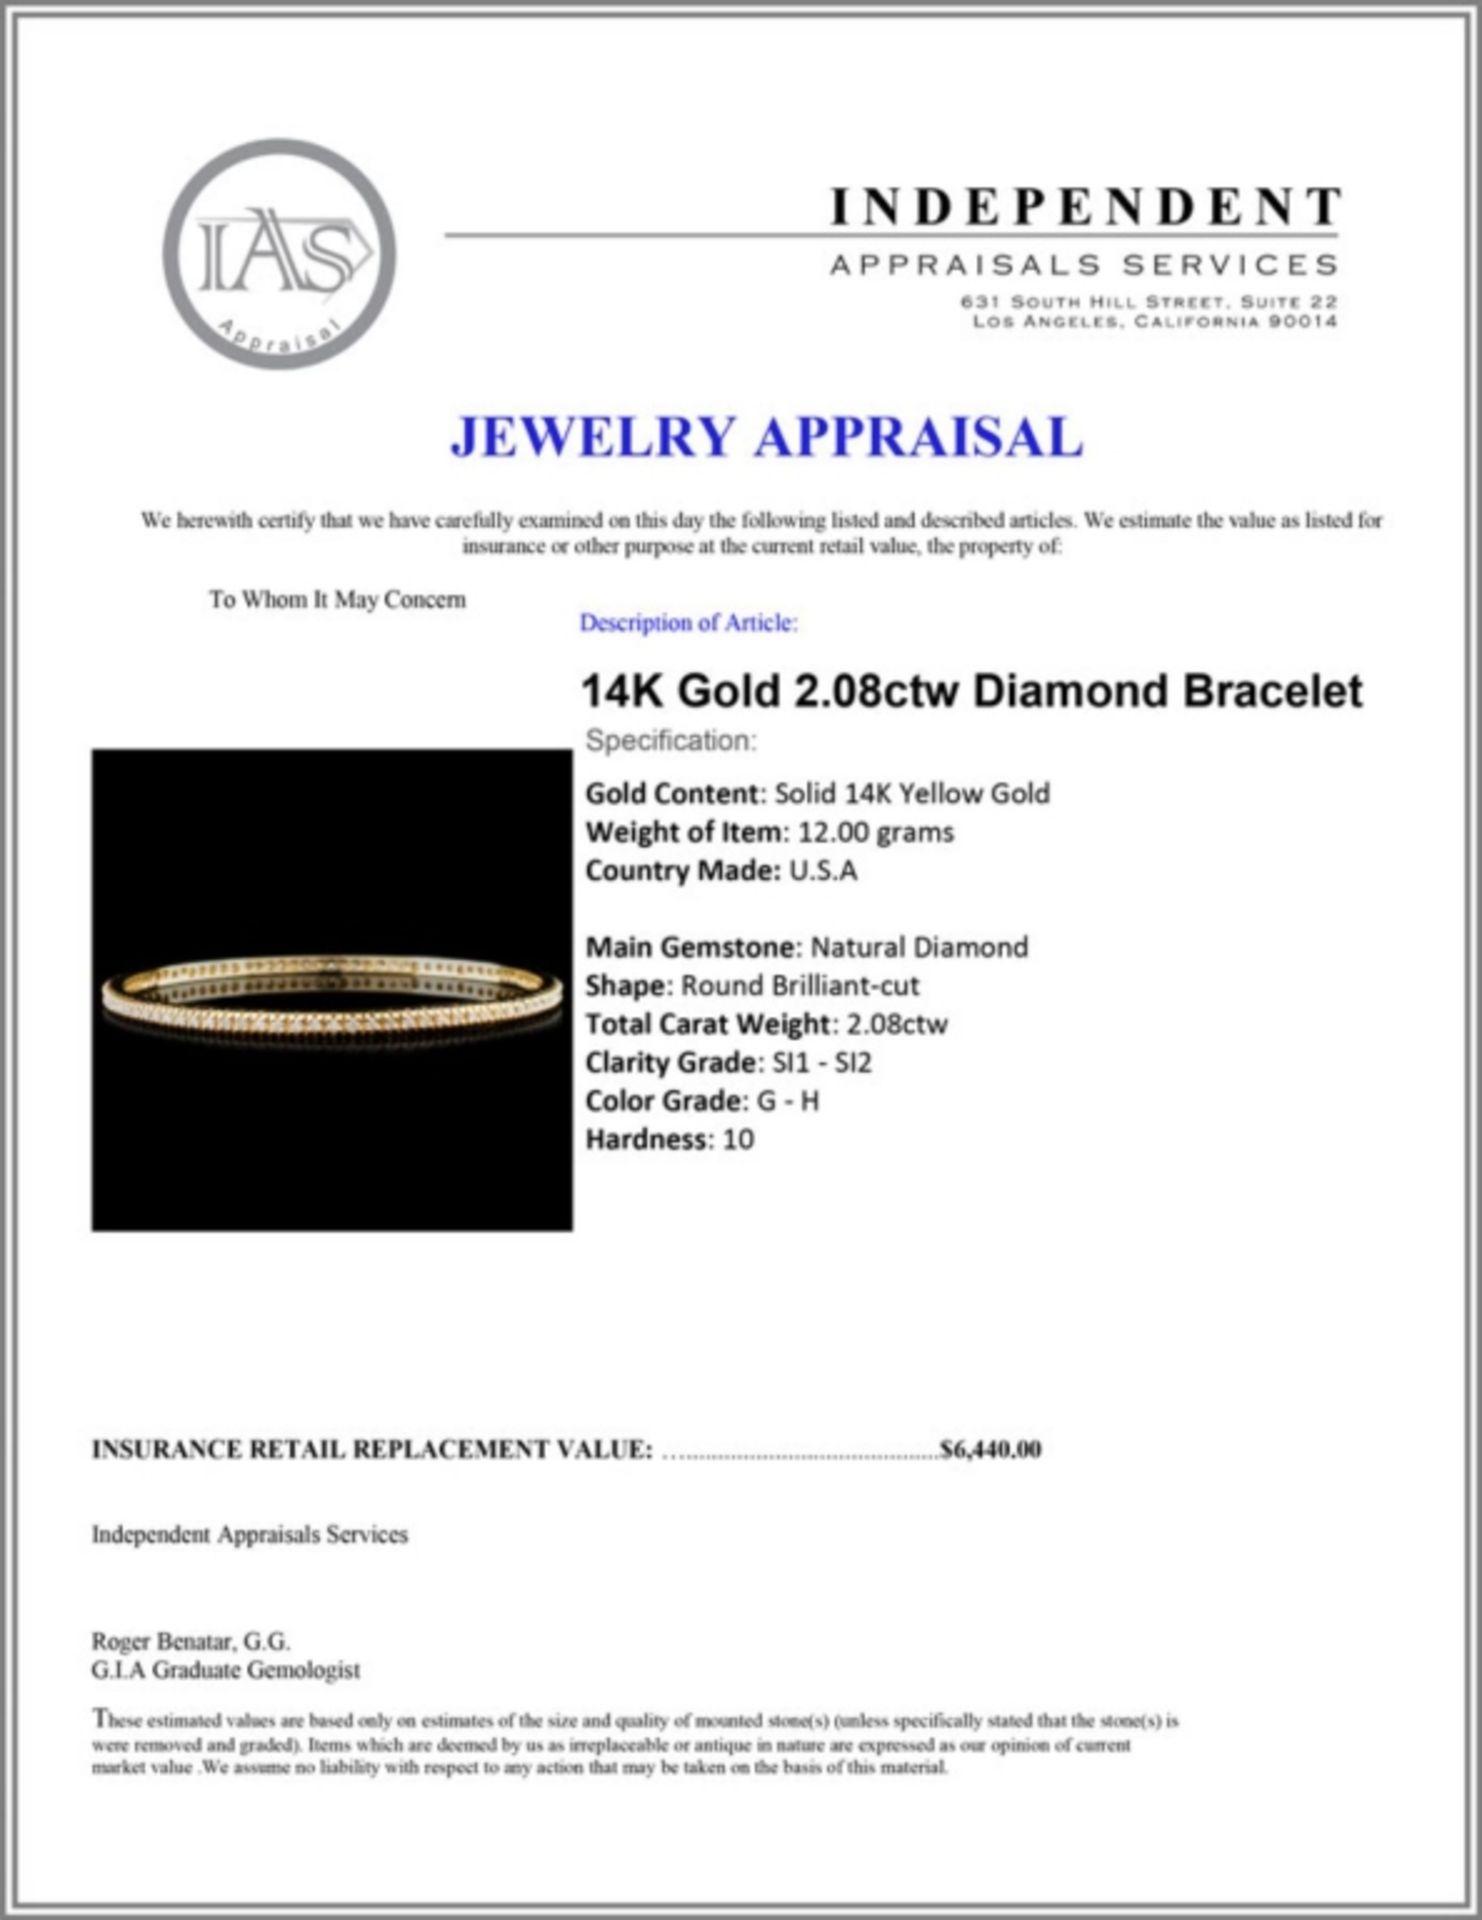 14K Gold 2.08ctw Diamond Bracelet - Image 3 of 3